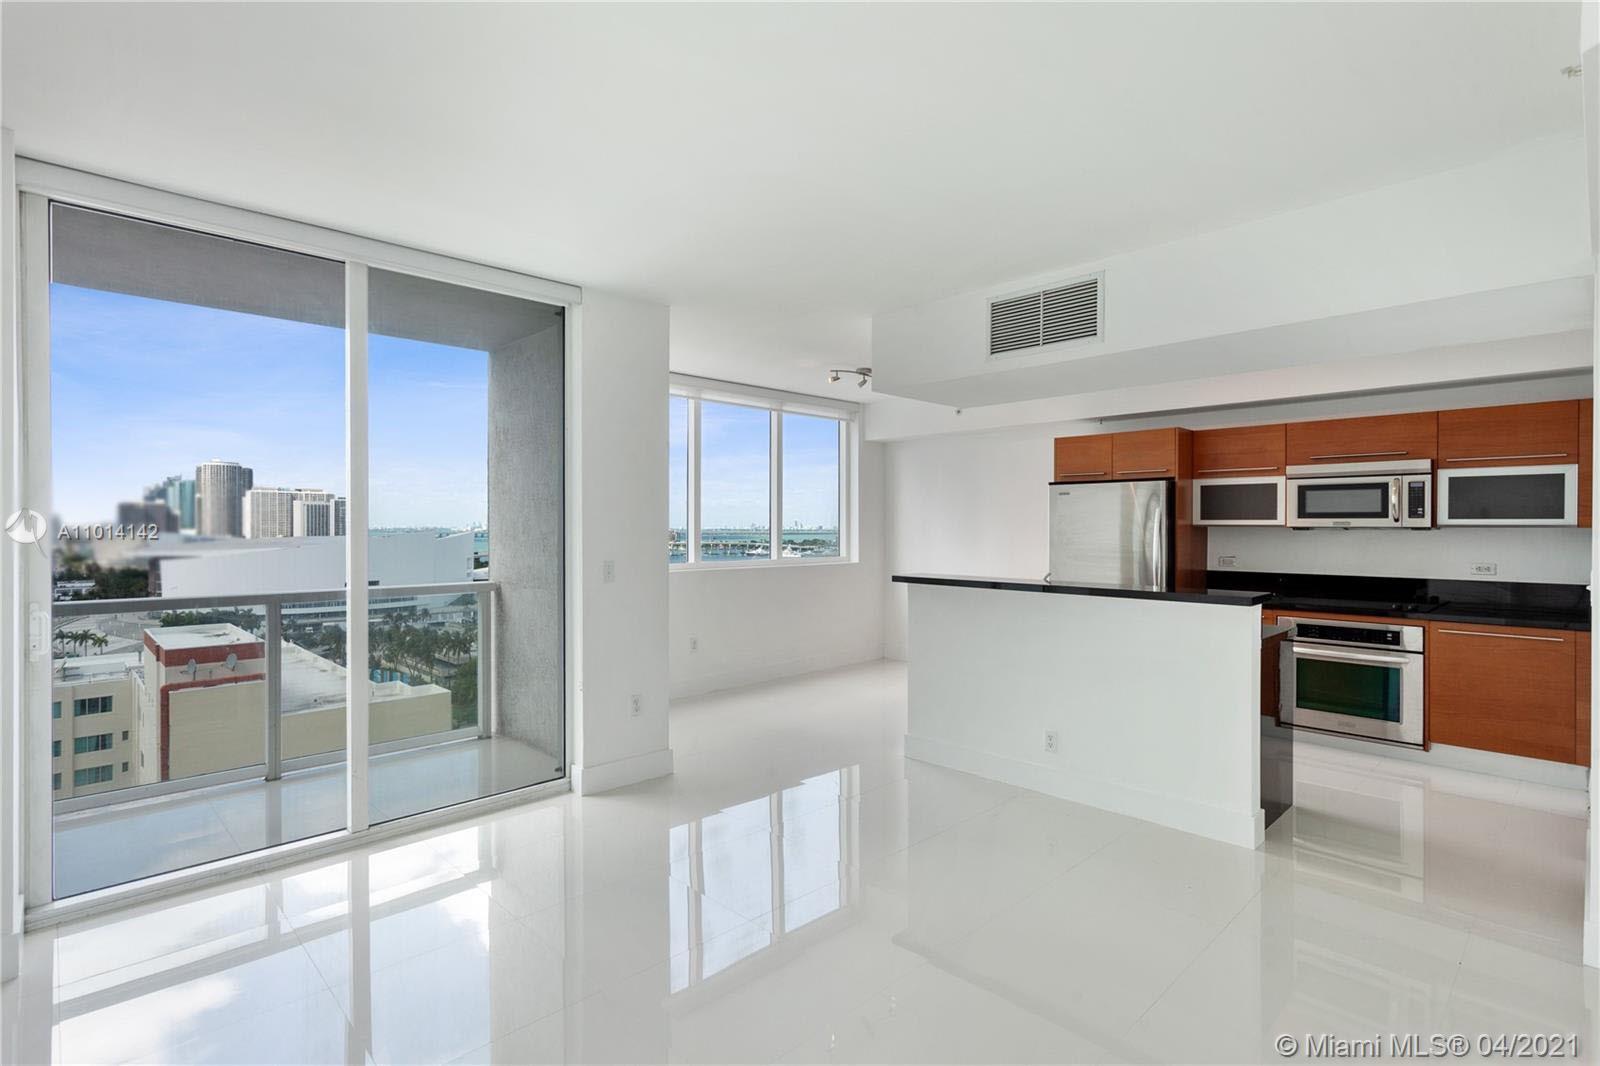 Apartment in Vizcayne North Condo located in Downtown Miami, 2 Bedrooms, 2 Bathrooms, all amanaties included.